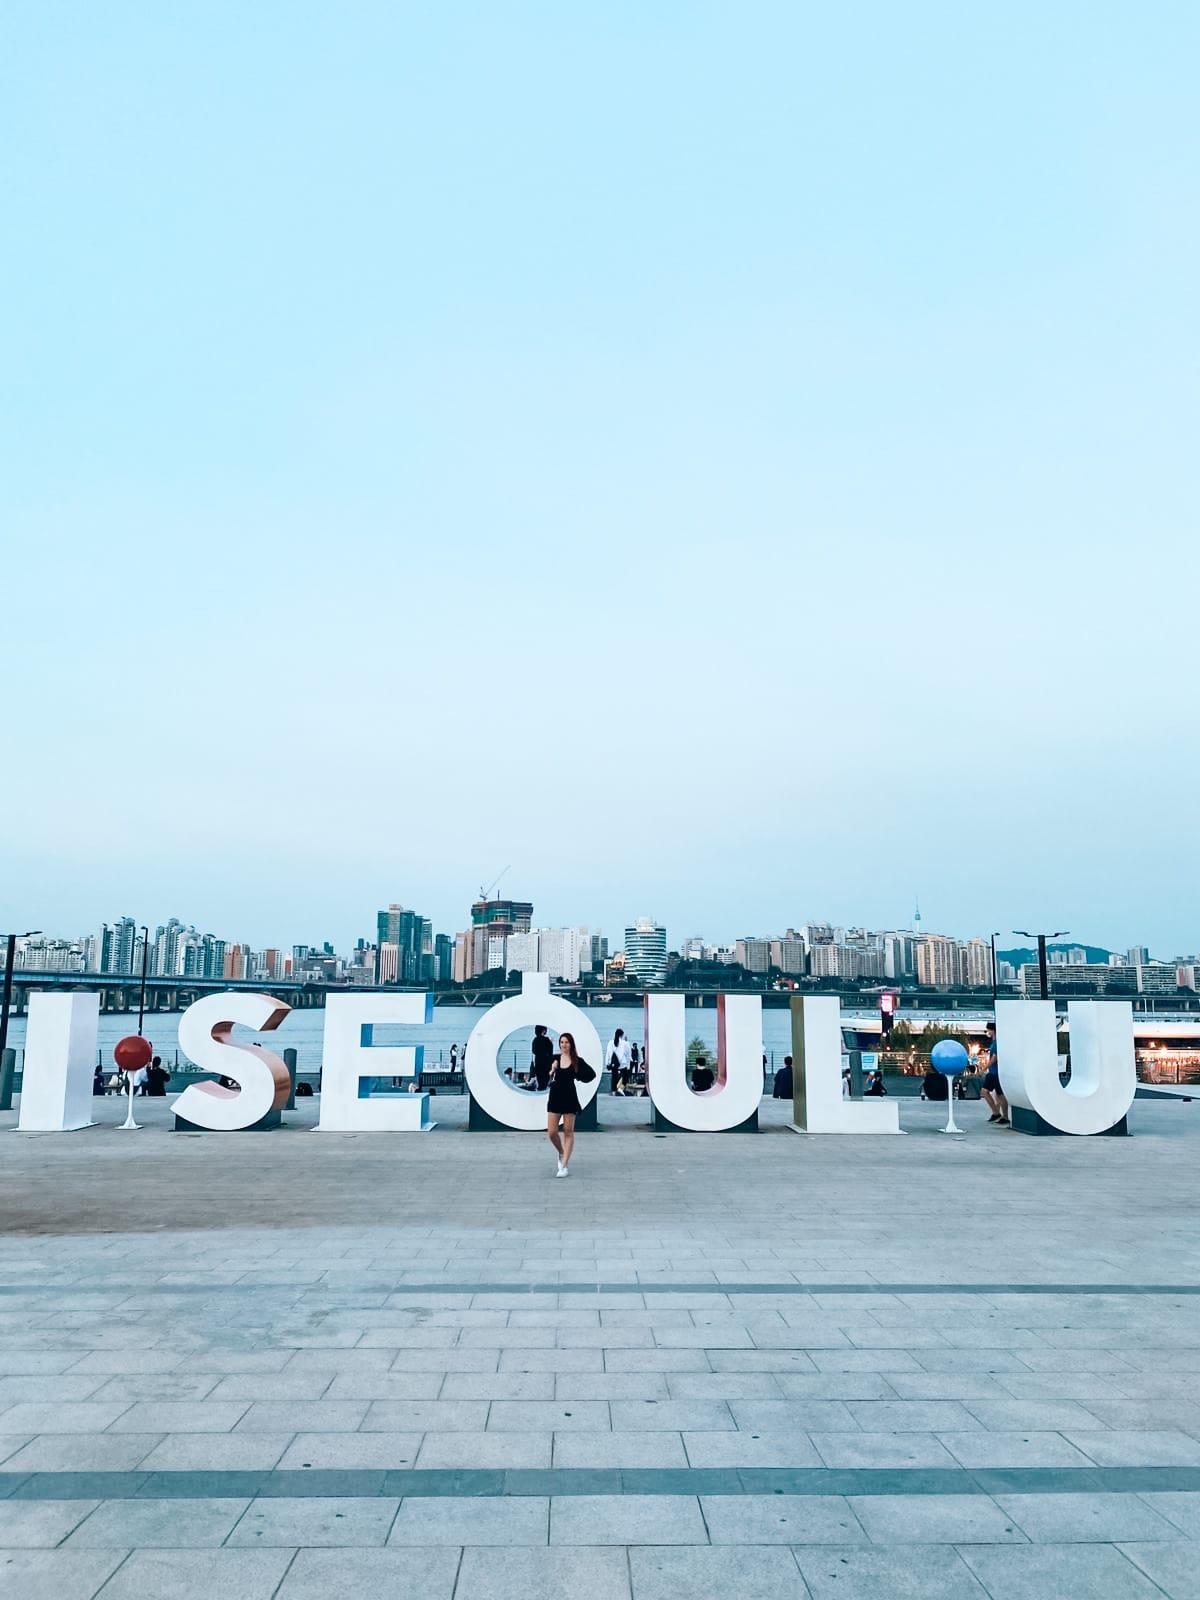 Die Stadtviertel in Seoul